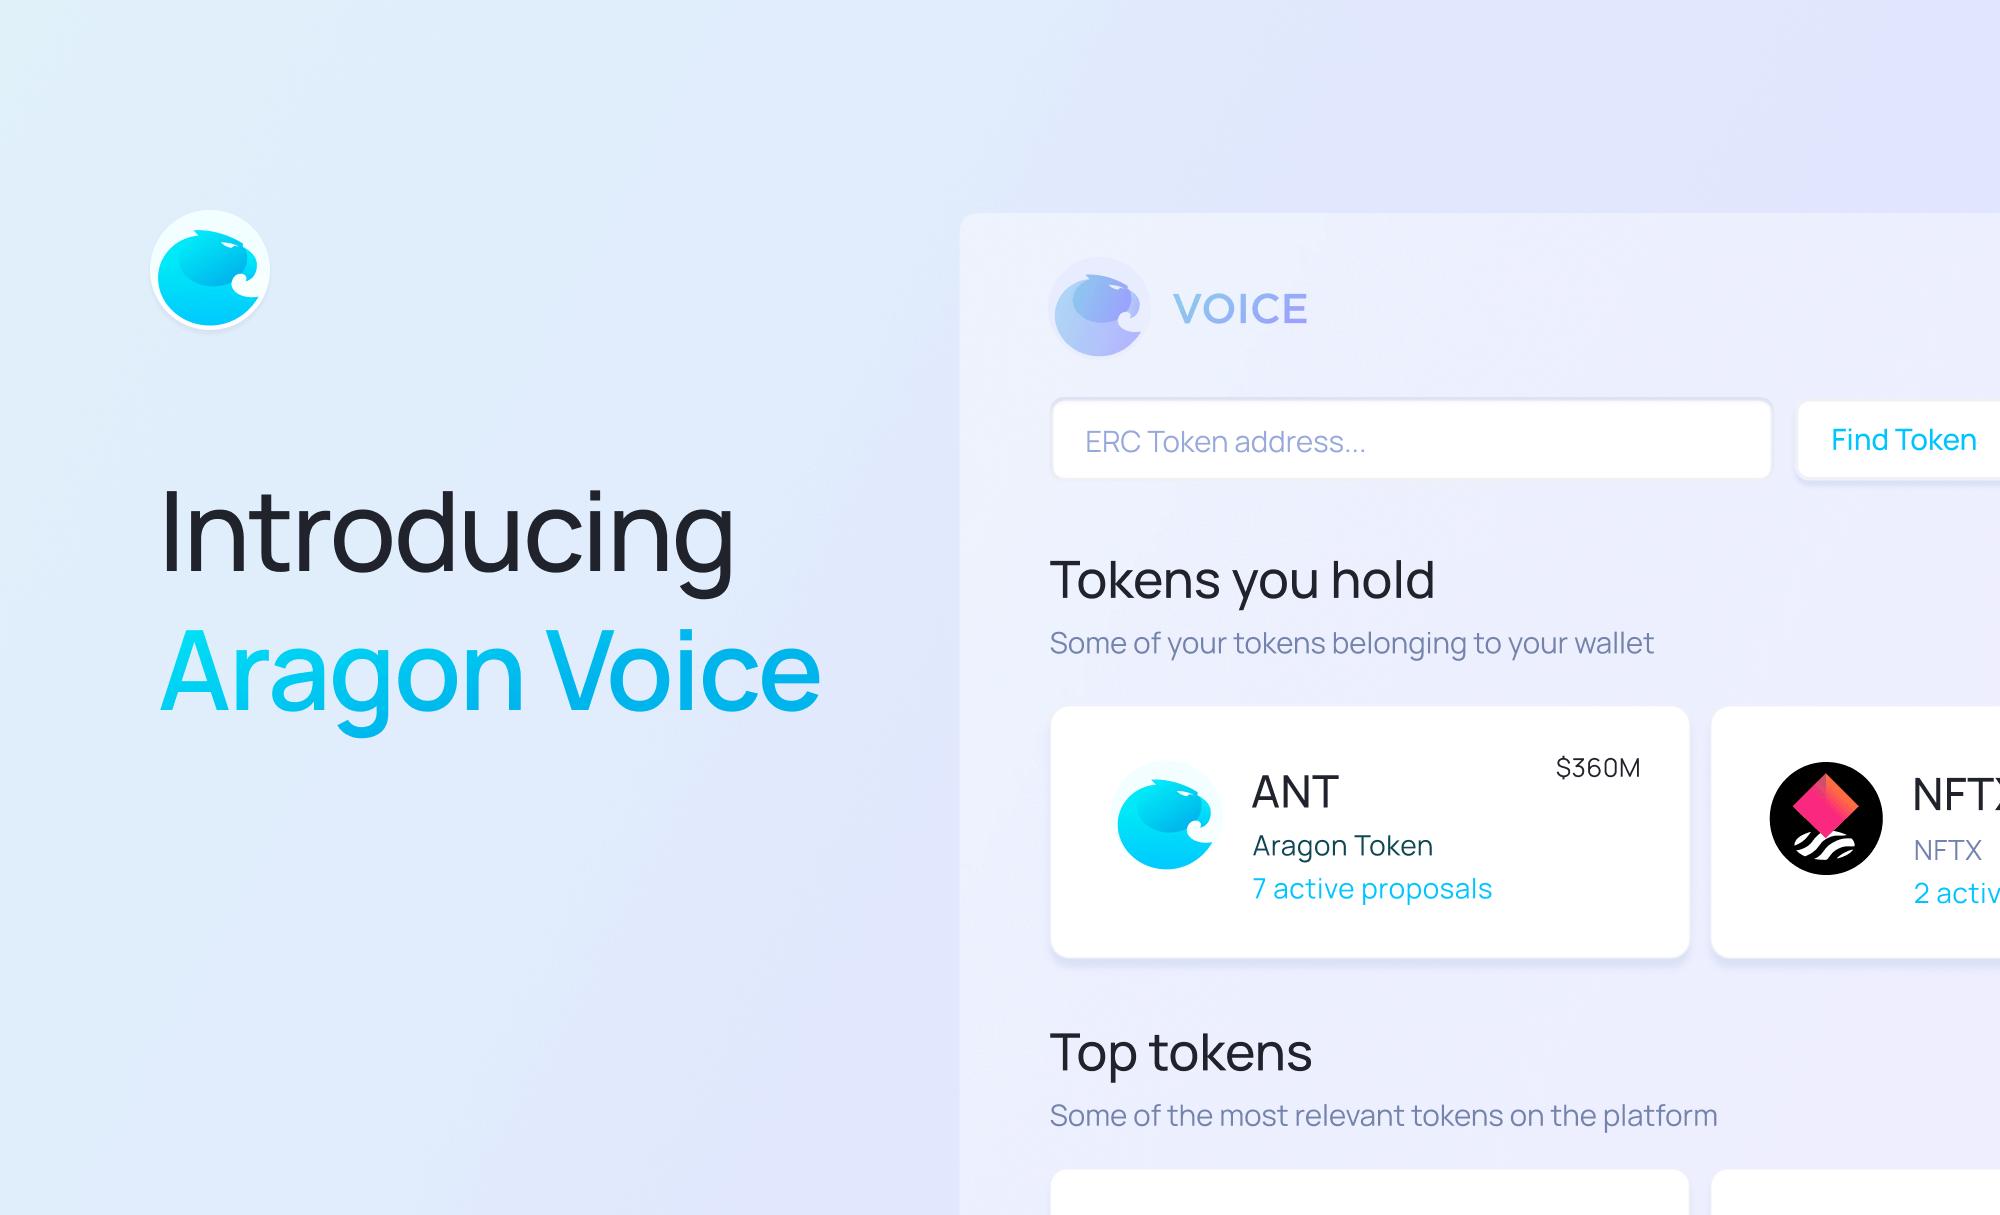 Introducing Aragon Voice